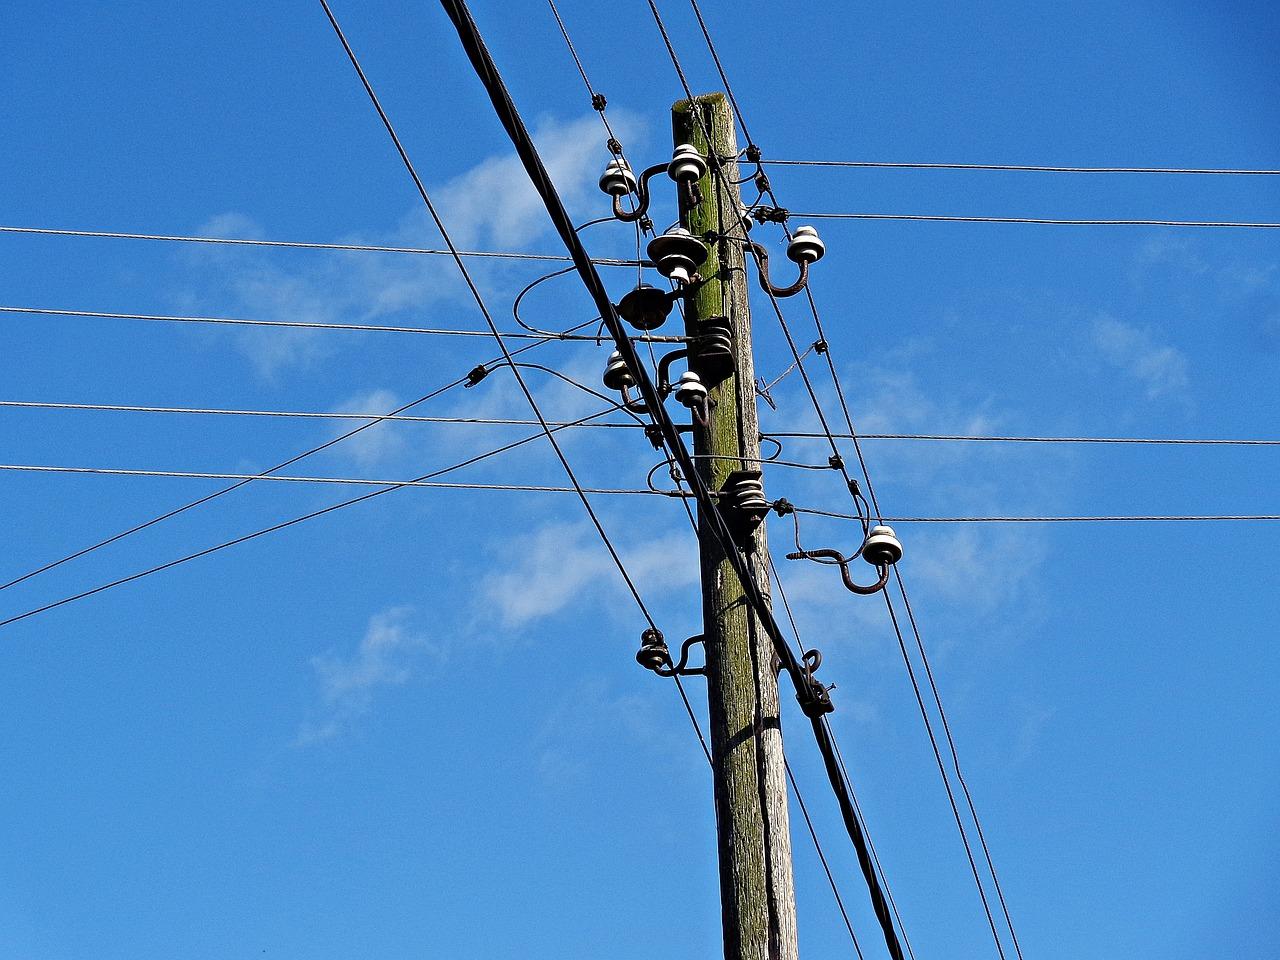 Электричество по проводам картинки